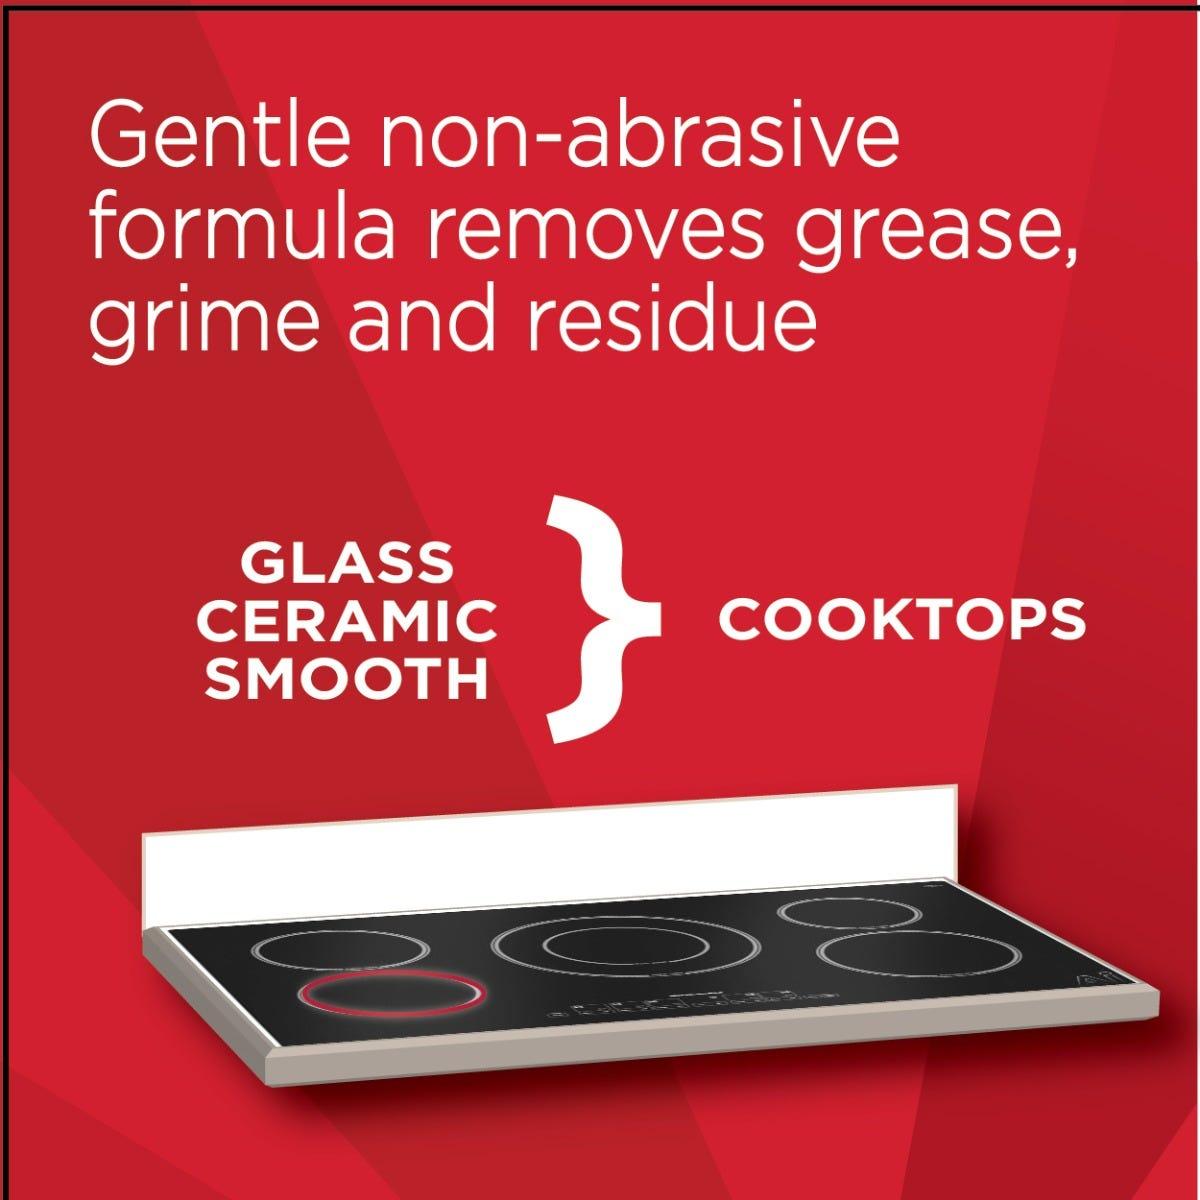 https://googone.com/media/catalog/product/m/a/magic_cooktop_cleaner_polish_surfaces.jpg